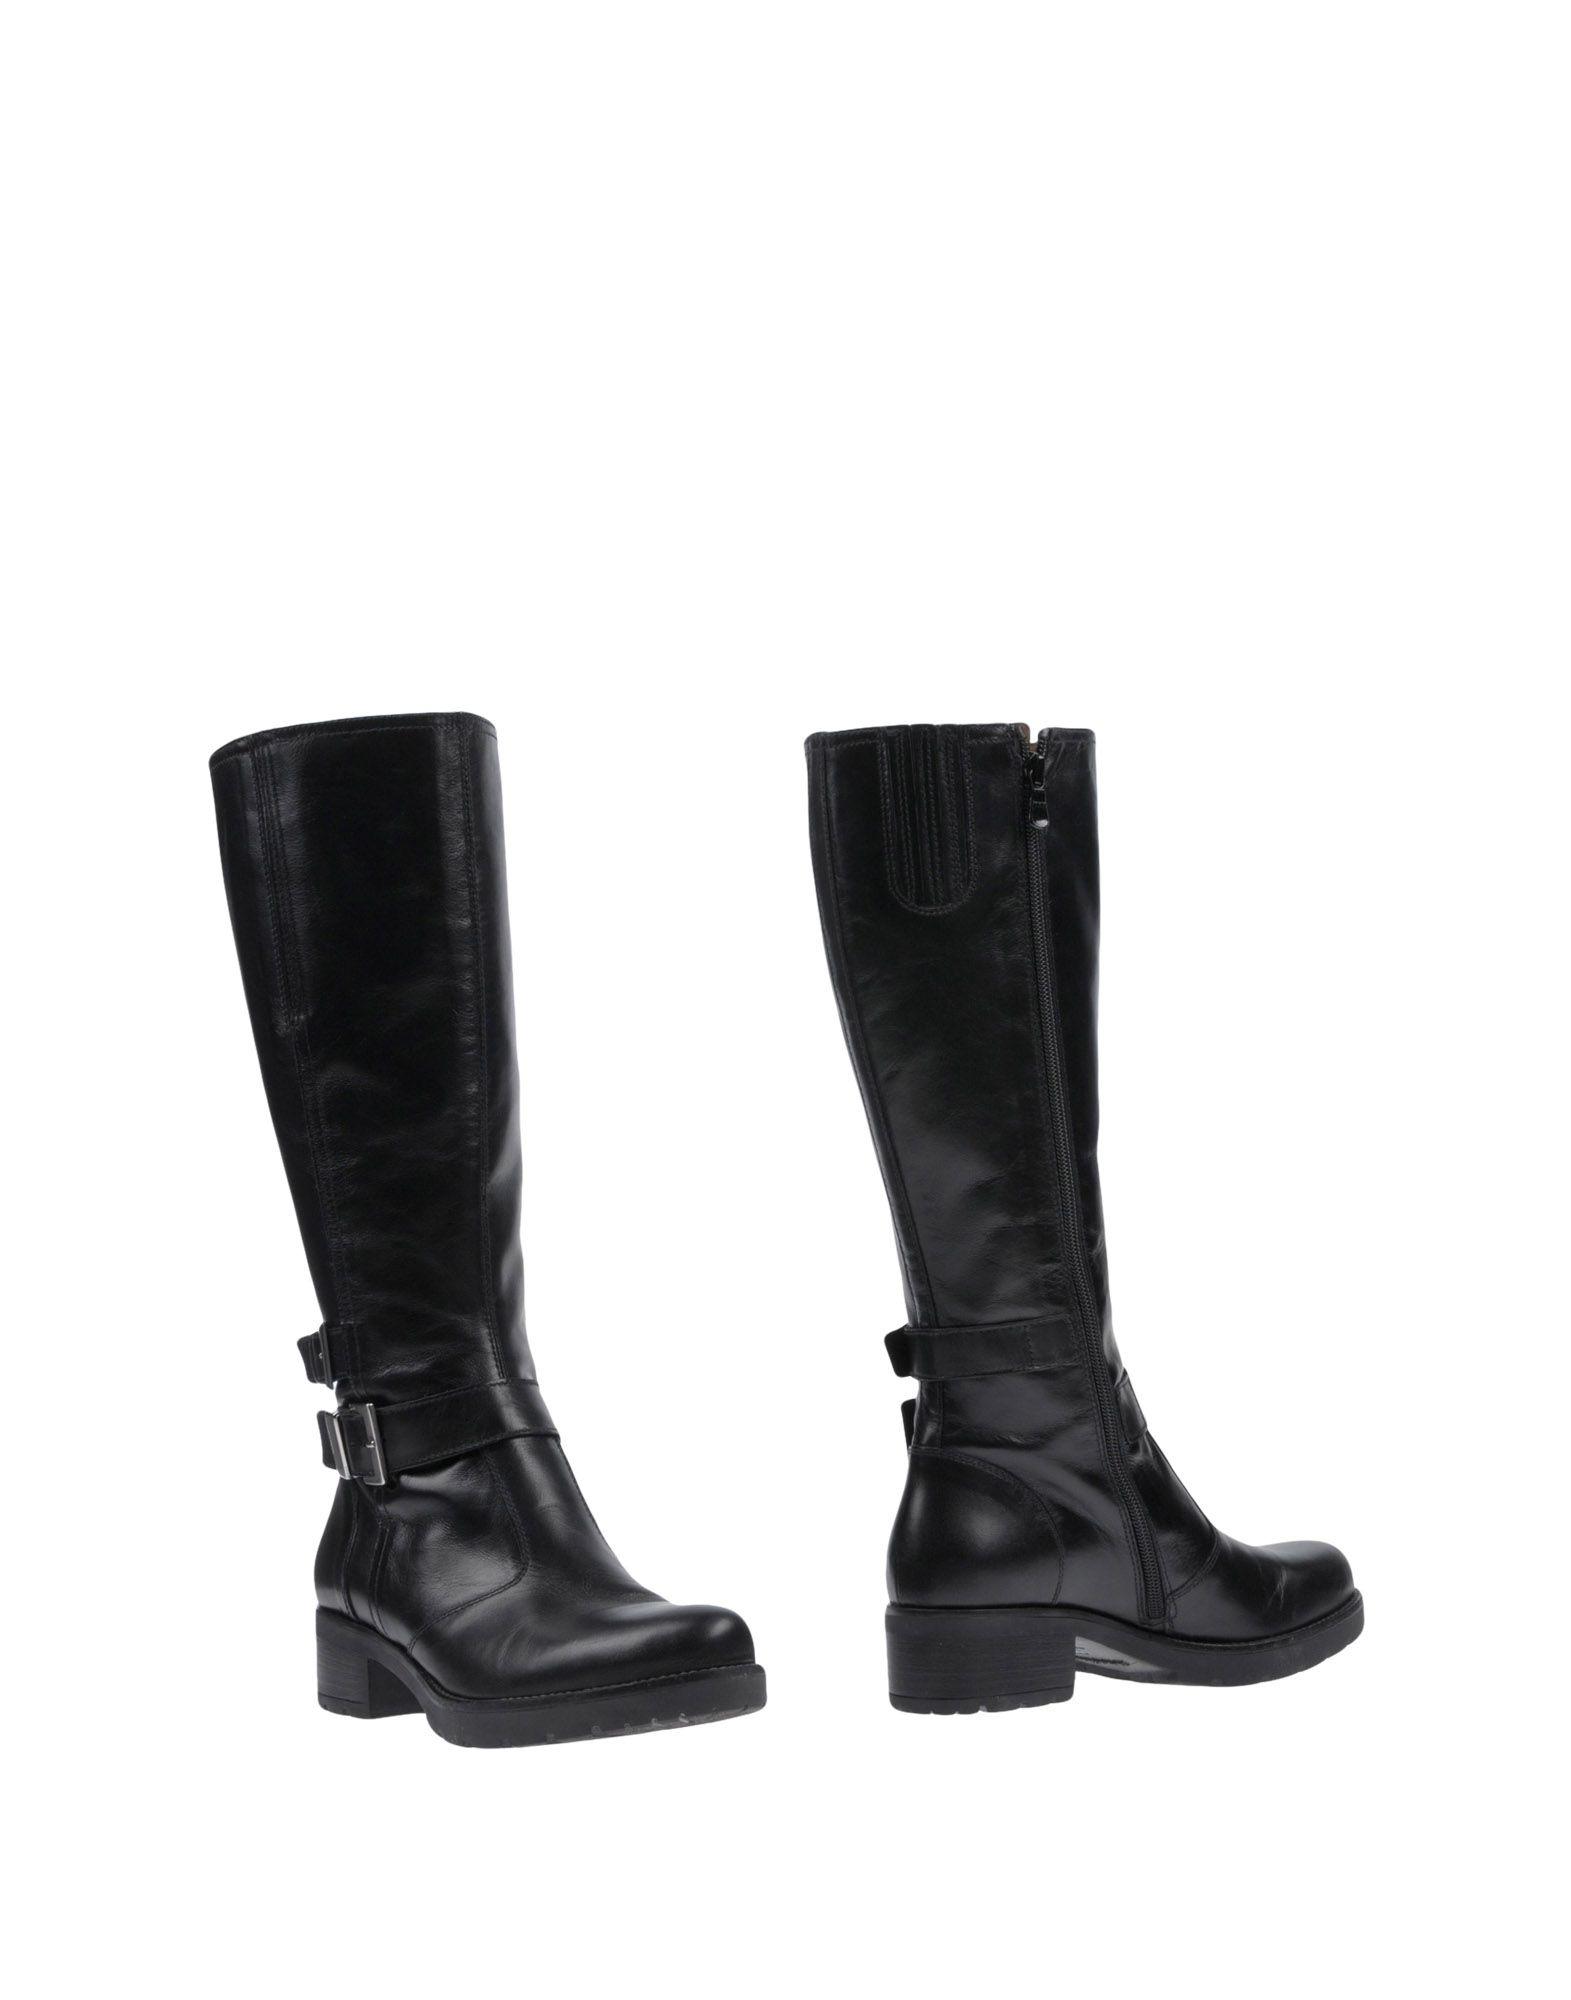 Nero Giardini Stiefel Damen  11455147MO Gute Qualität beliebte Schuhe